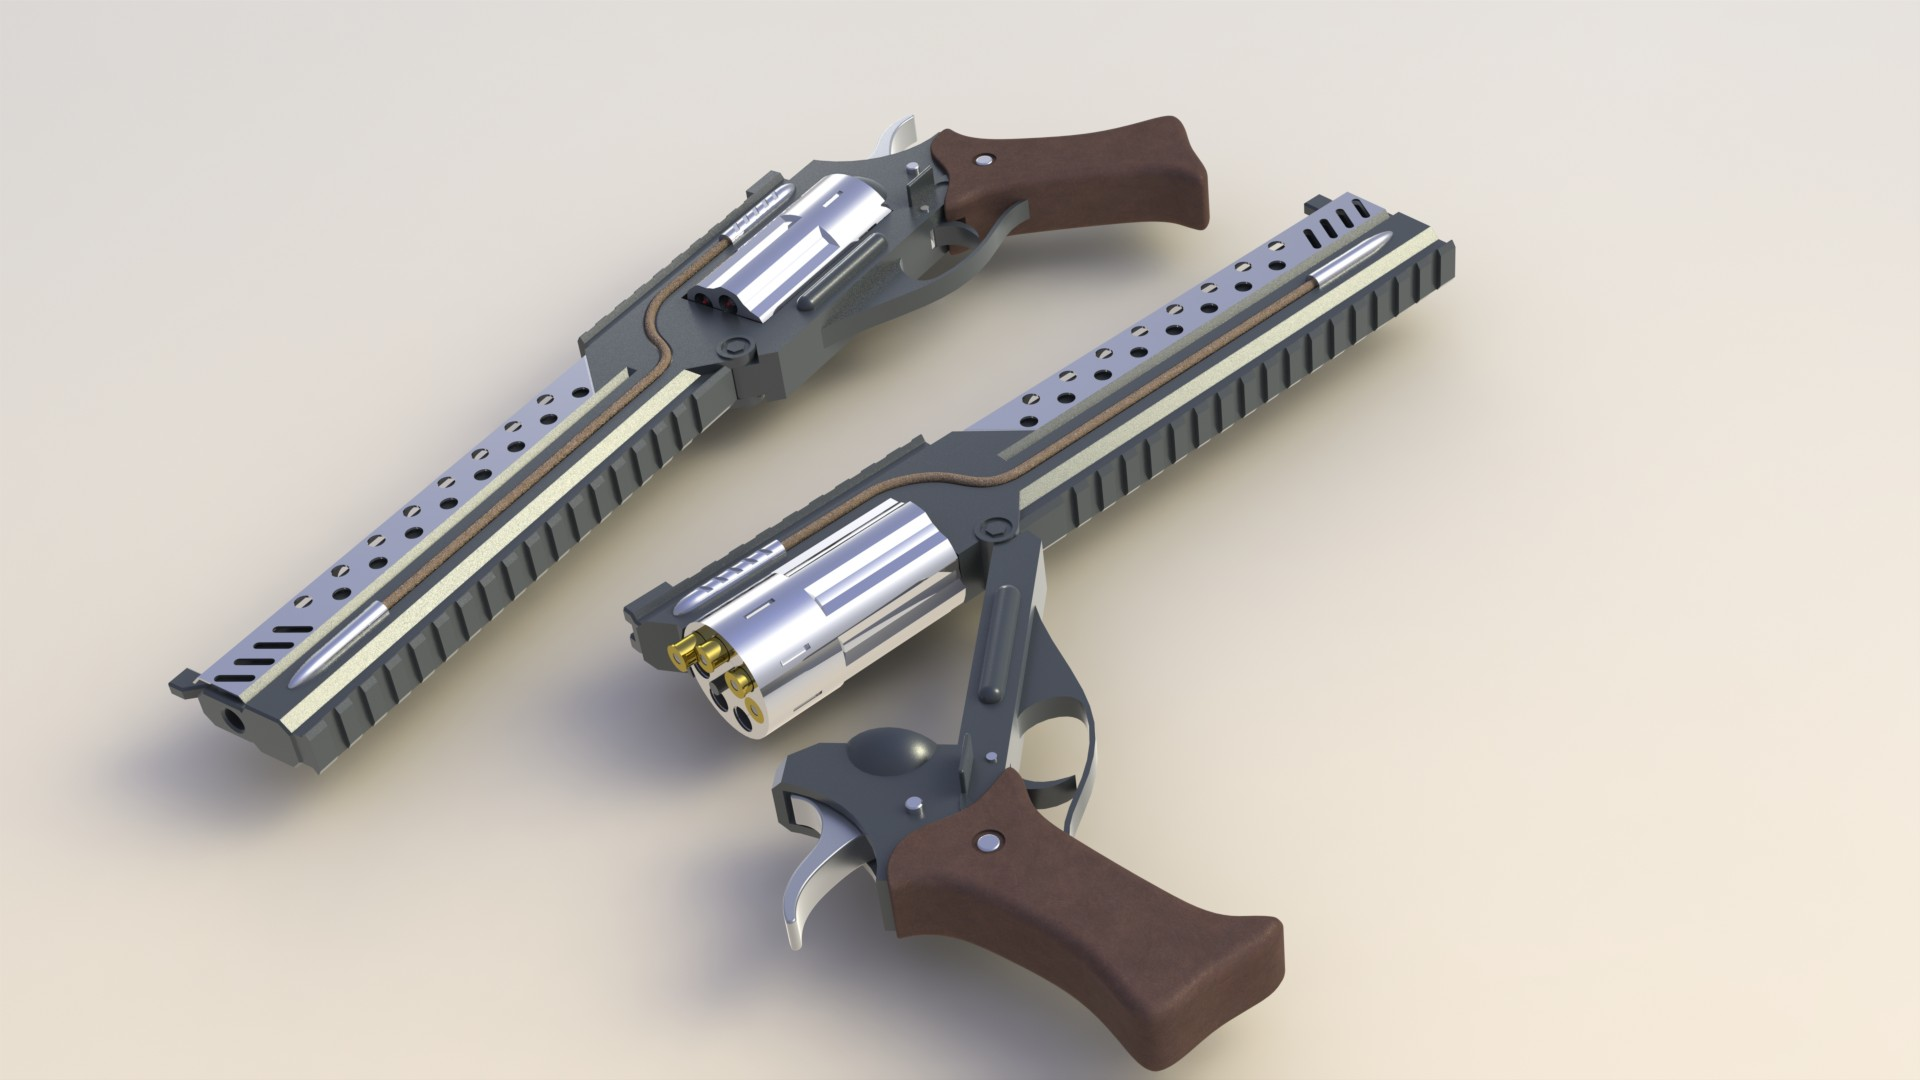 Wesson Kane Mod 526 Revolver By Steamtank On Deviantart